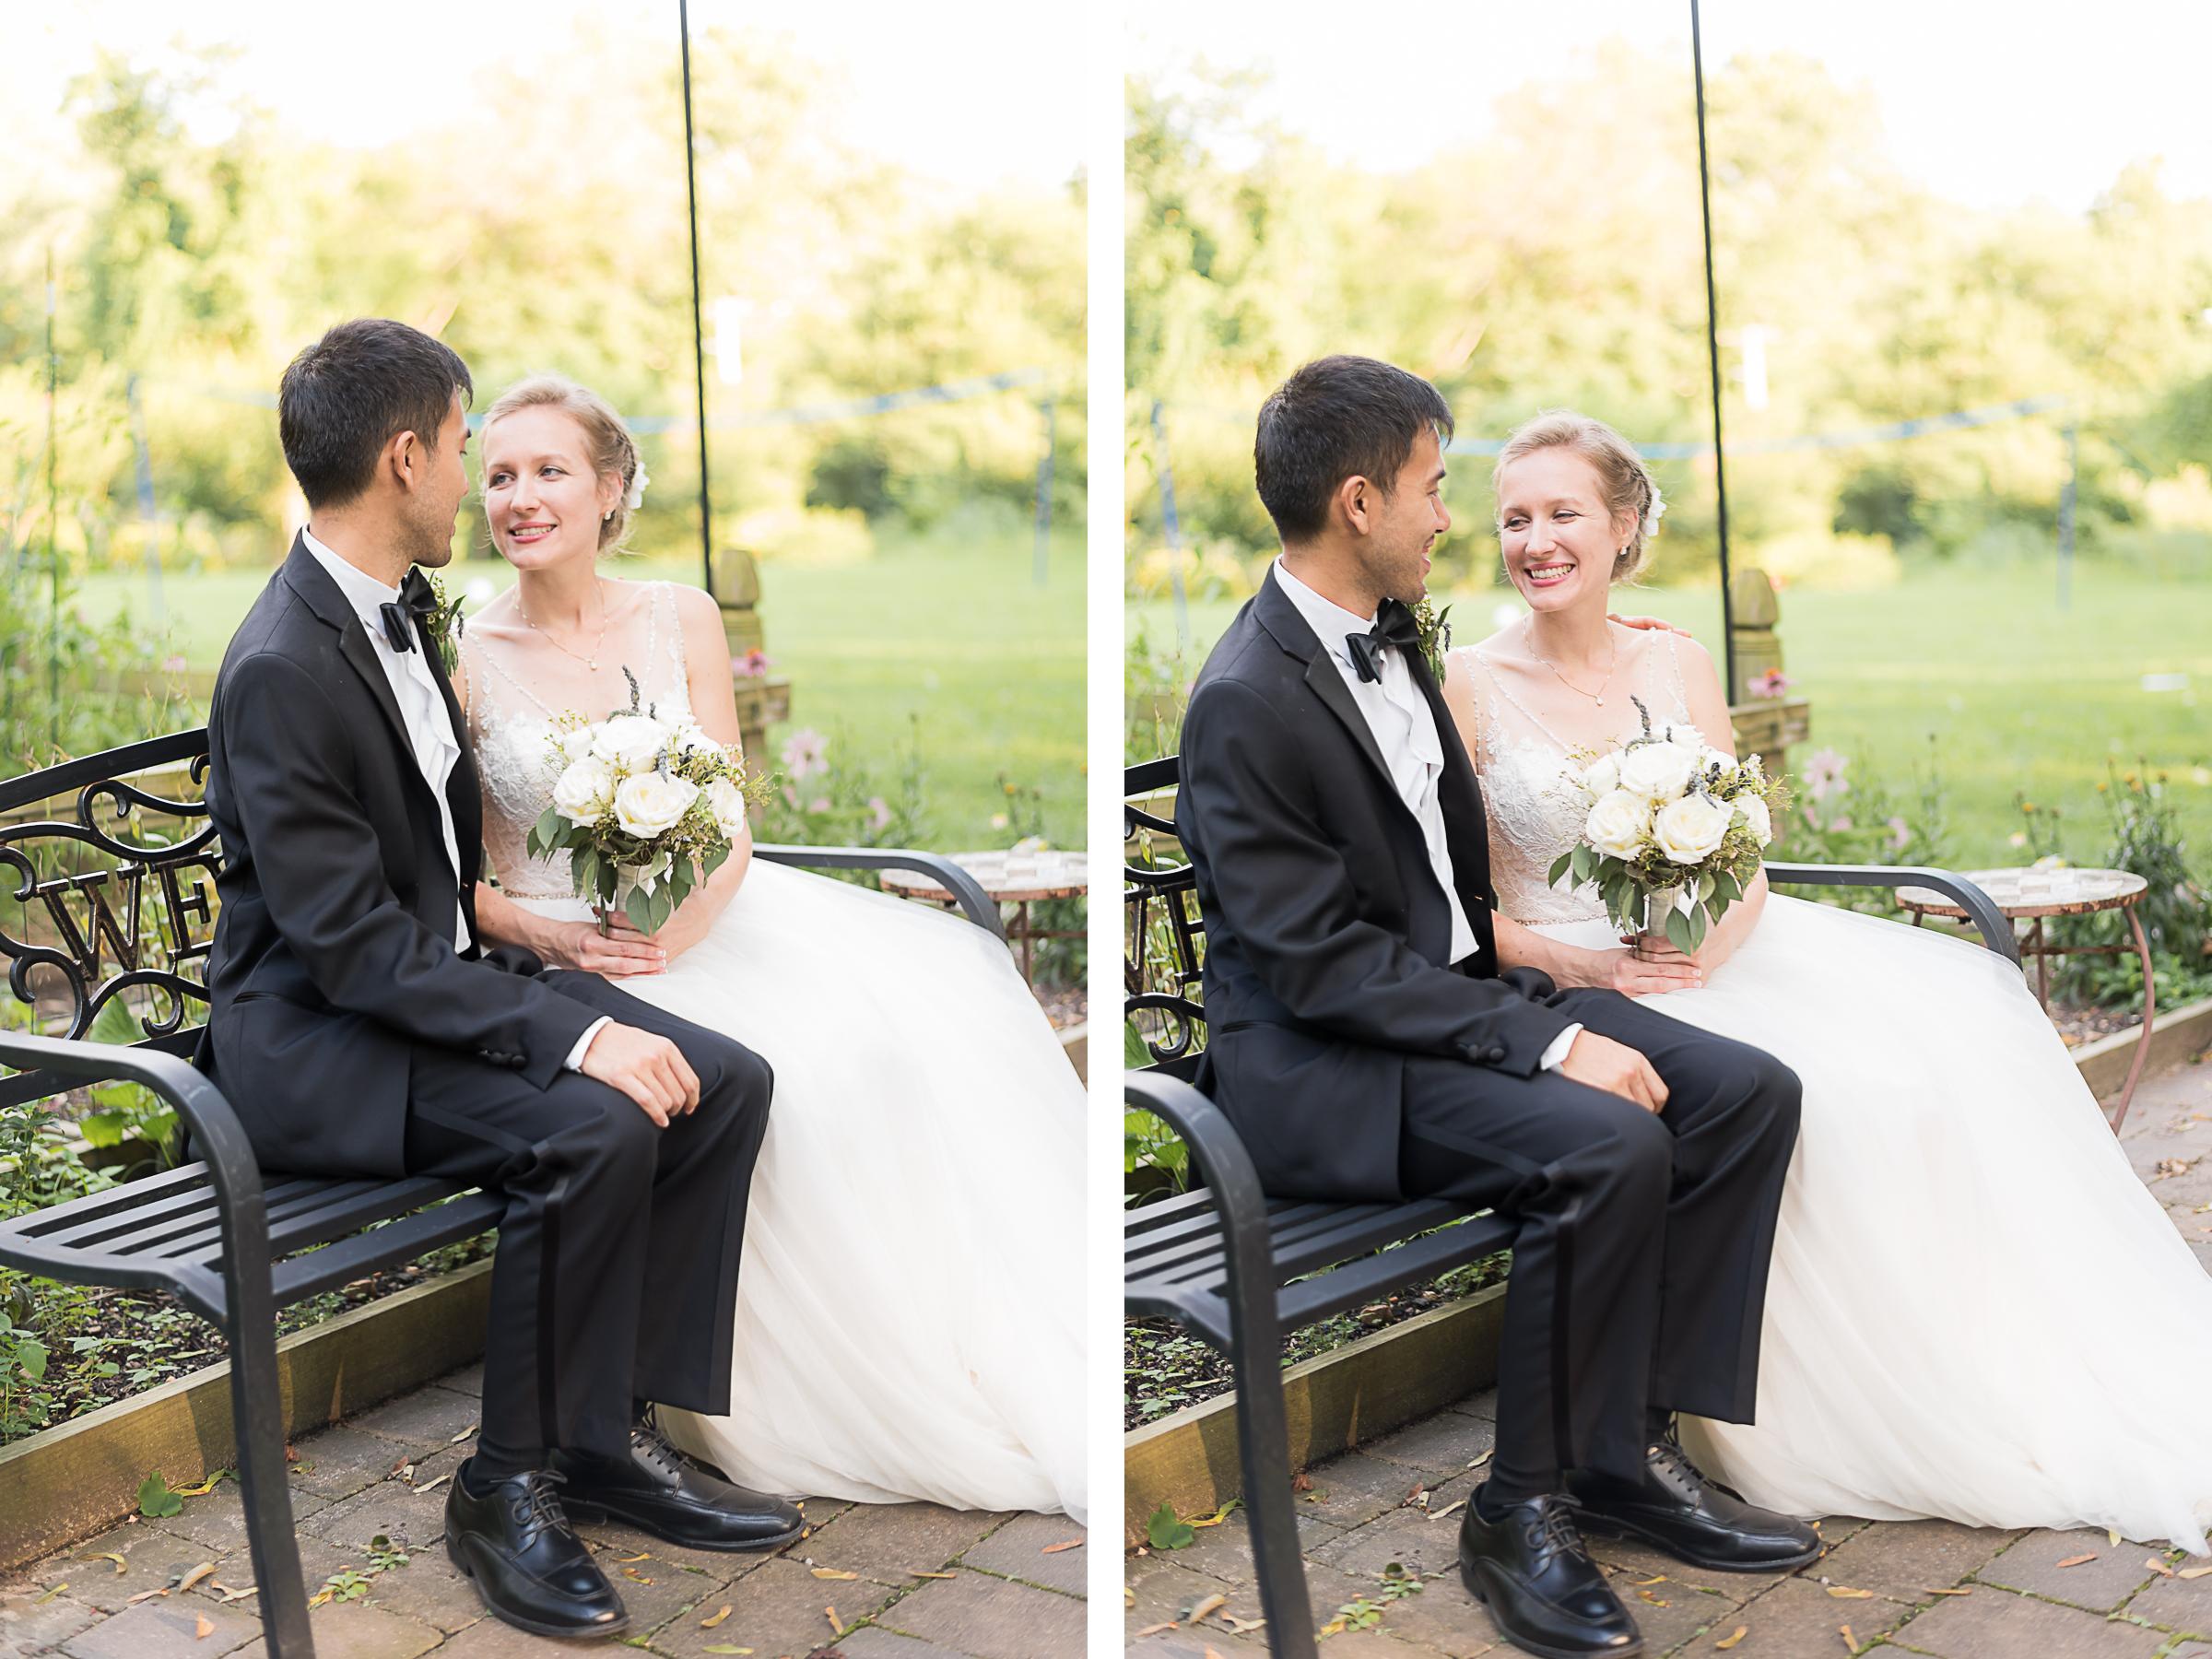 Elkridge-Furnace-Inn-Wedding-Bride-Groom-Portraits